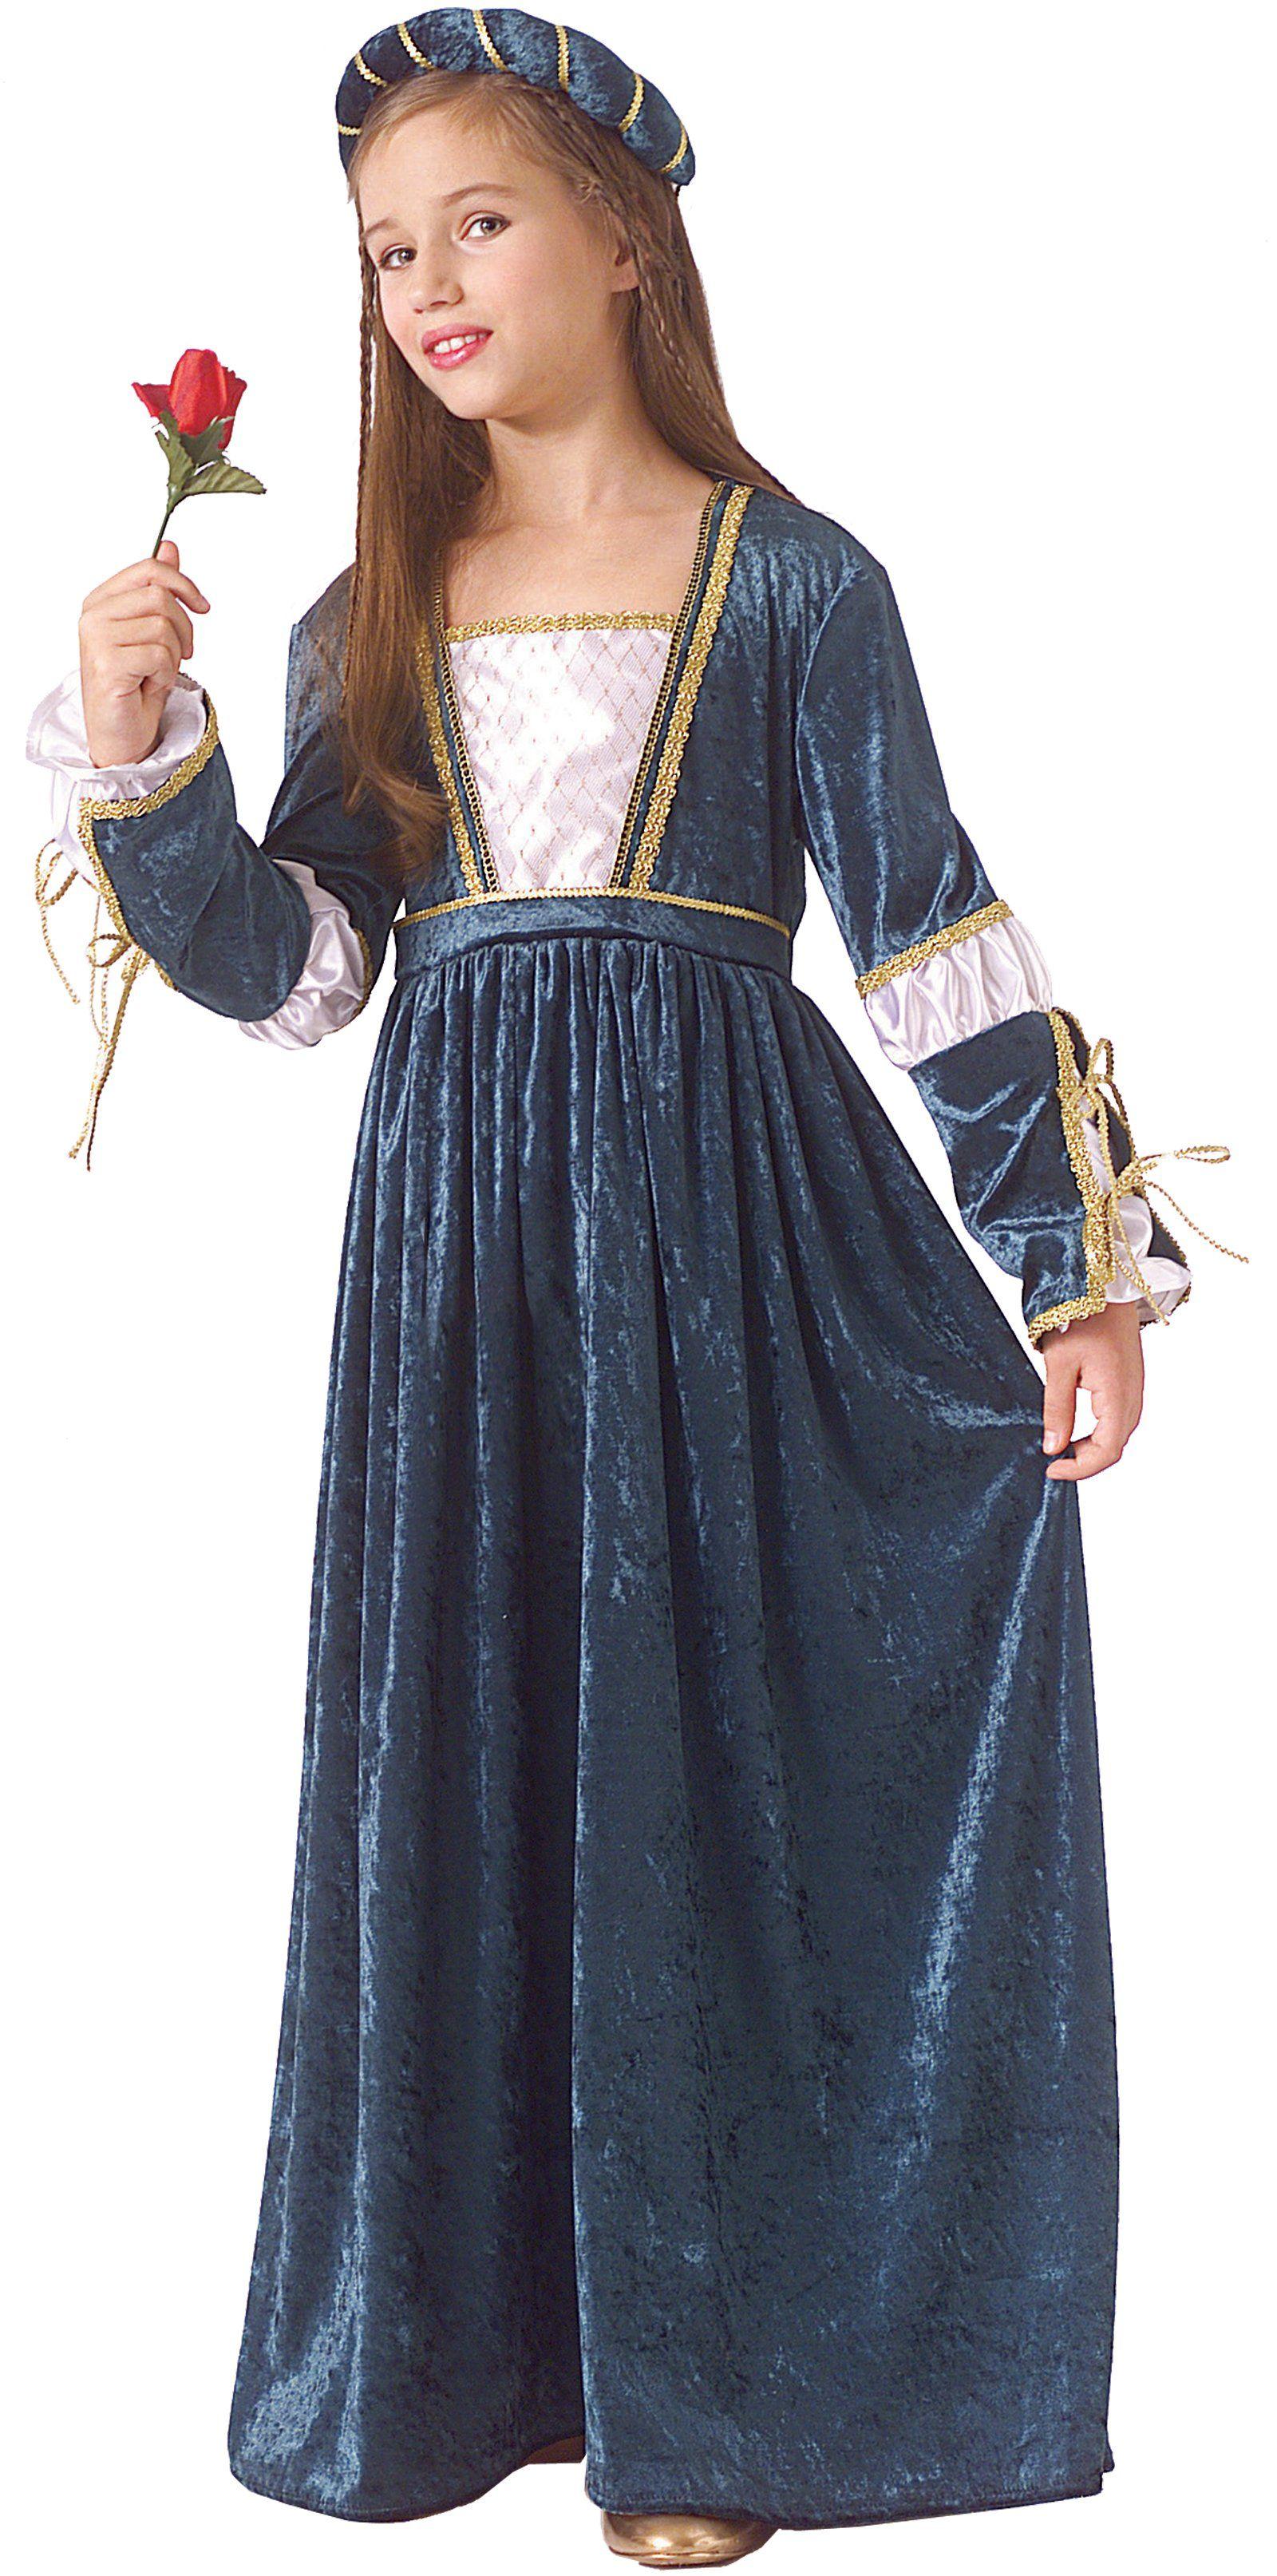 Juliet Child Costume | Children costumes, Costumes and Halloween ...